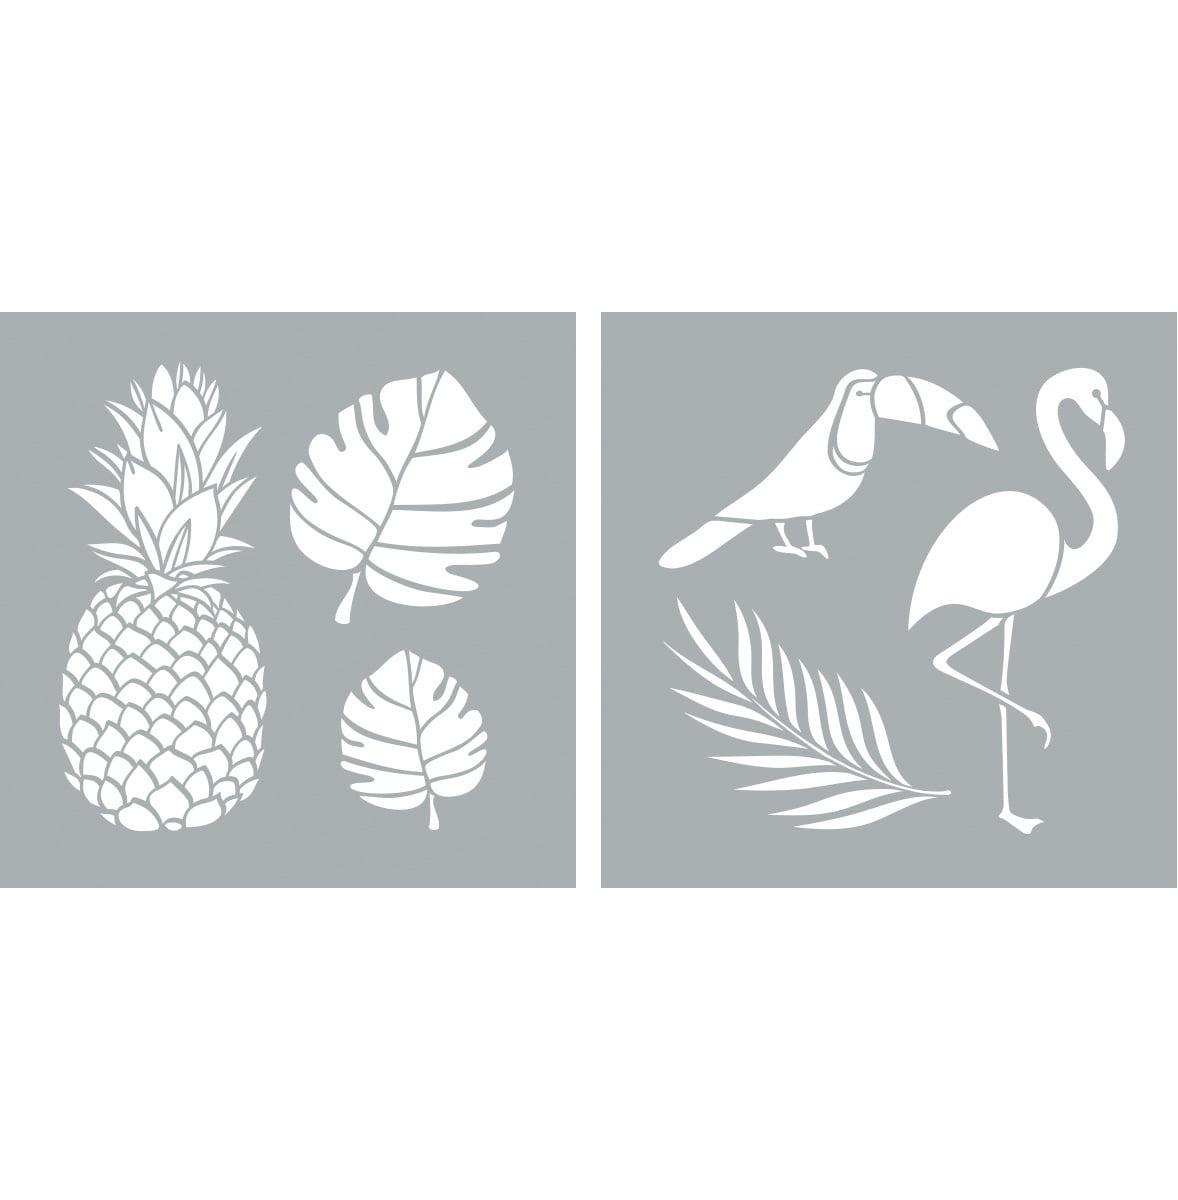 Decoart Americana Decor Stencil 8x8 Tropical